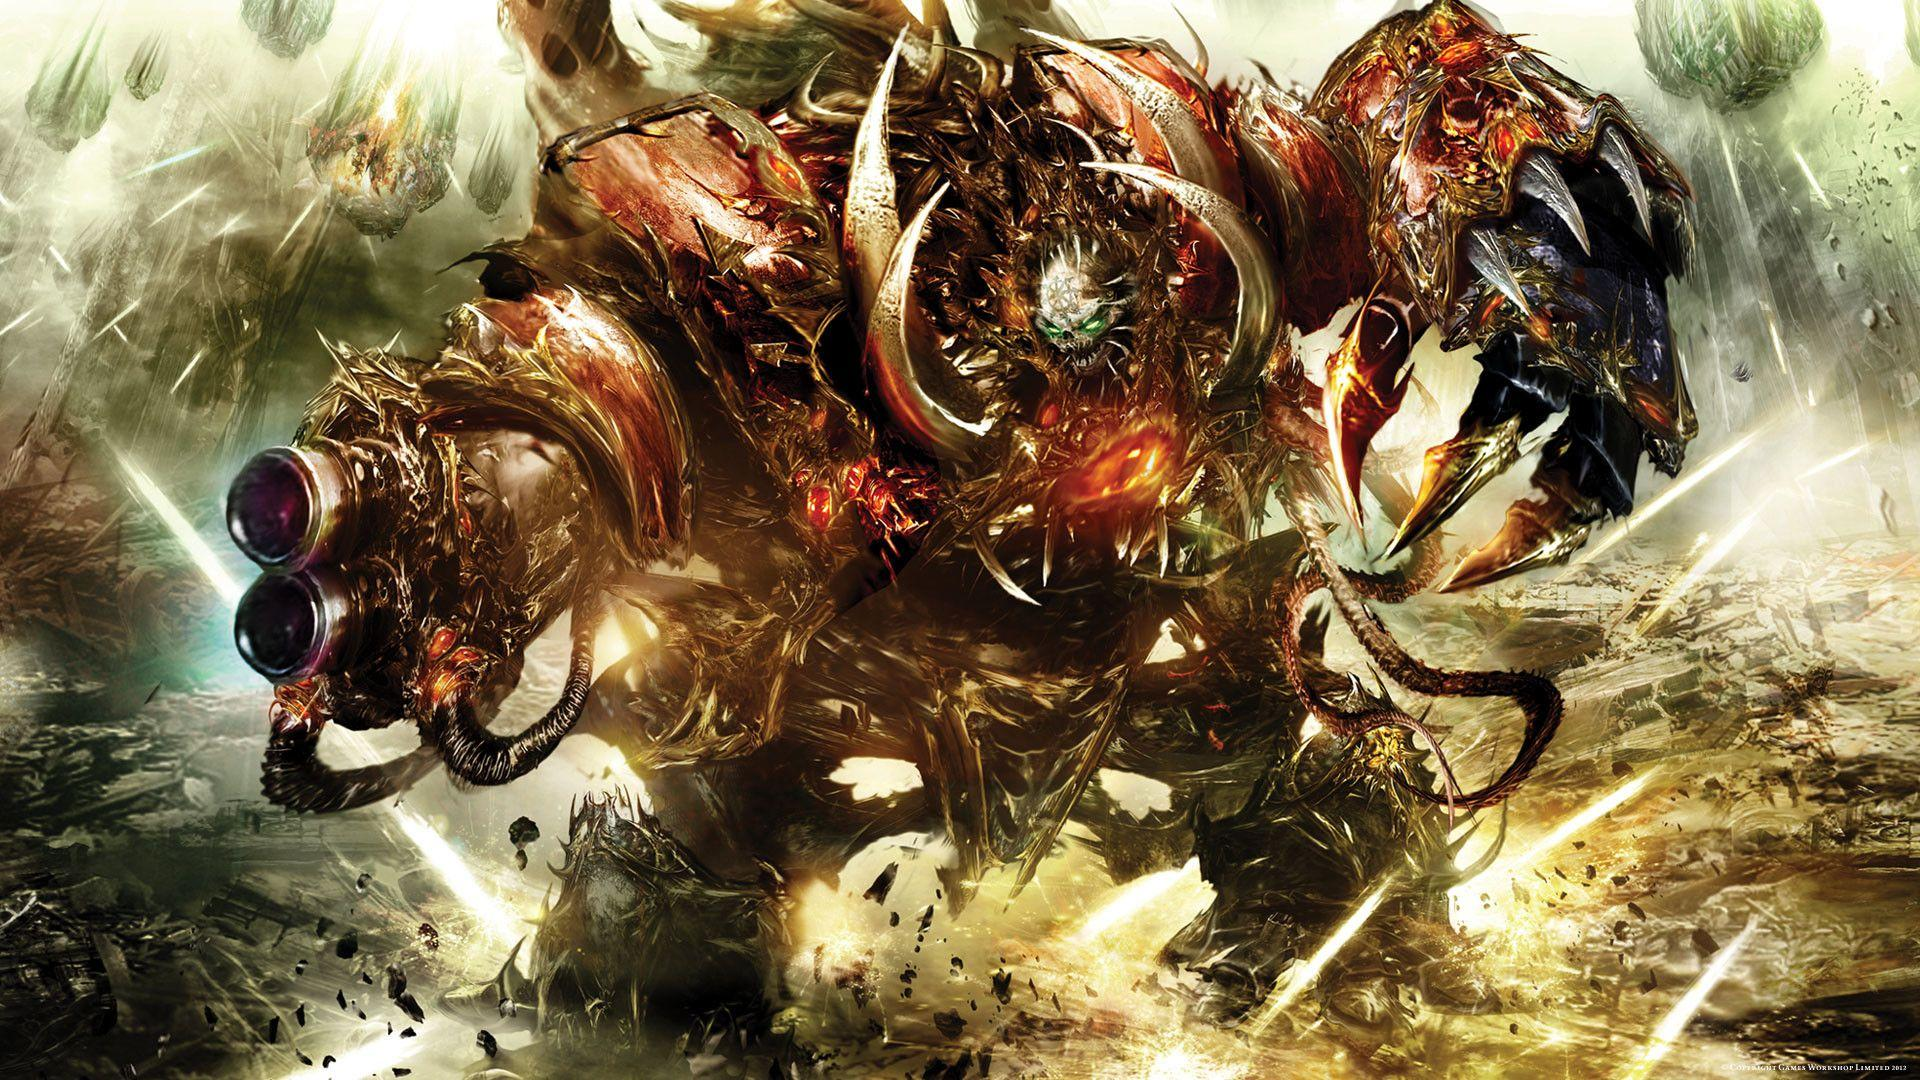 Warhammer 40k Chaos Wallpaper - WallpaperSafari